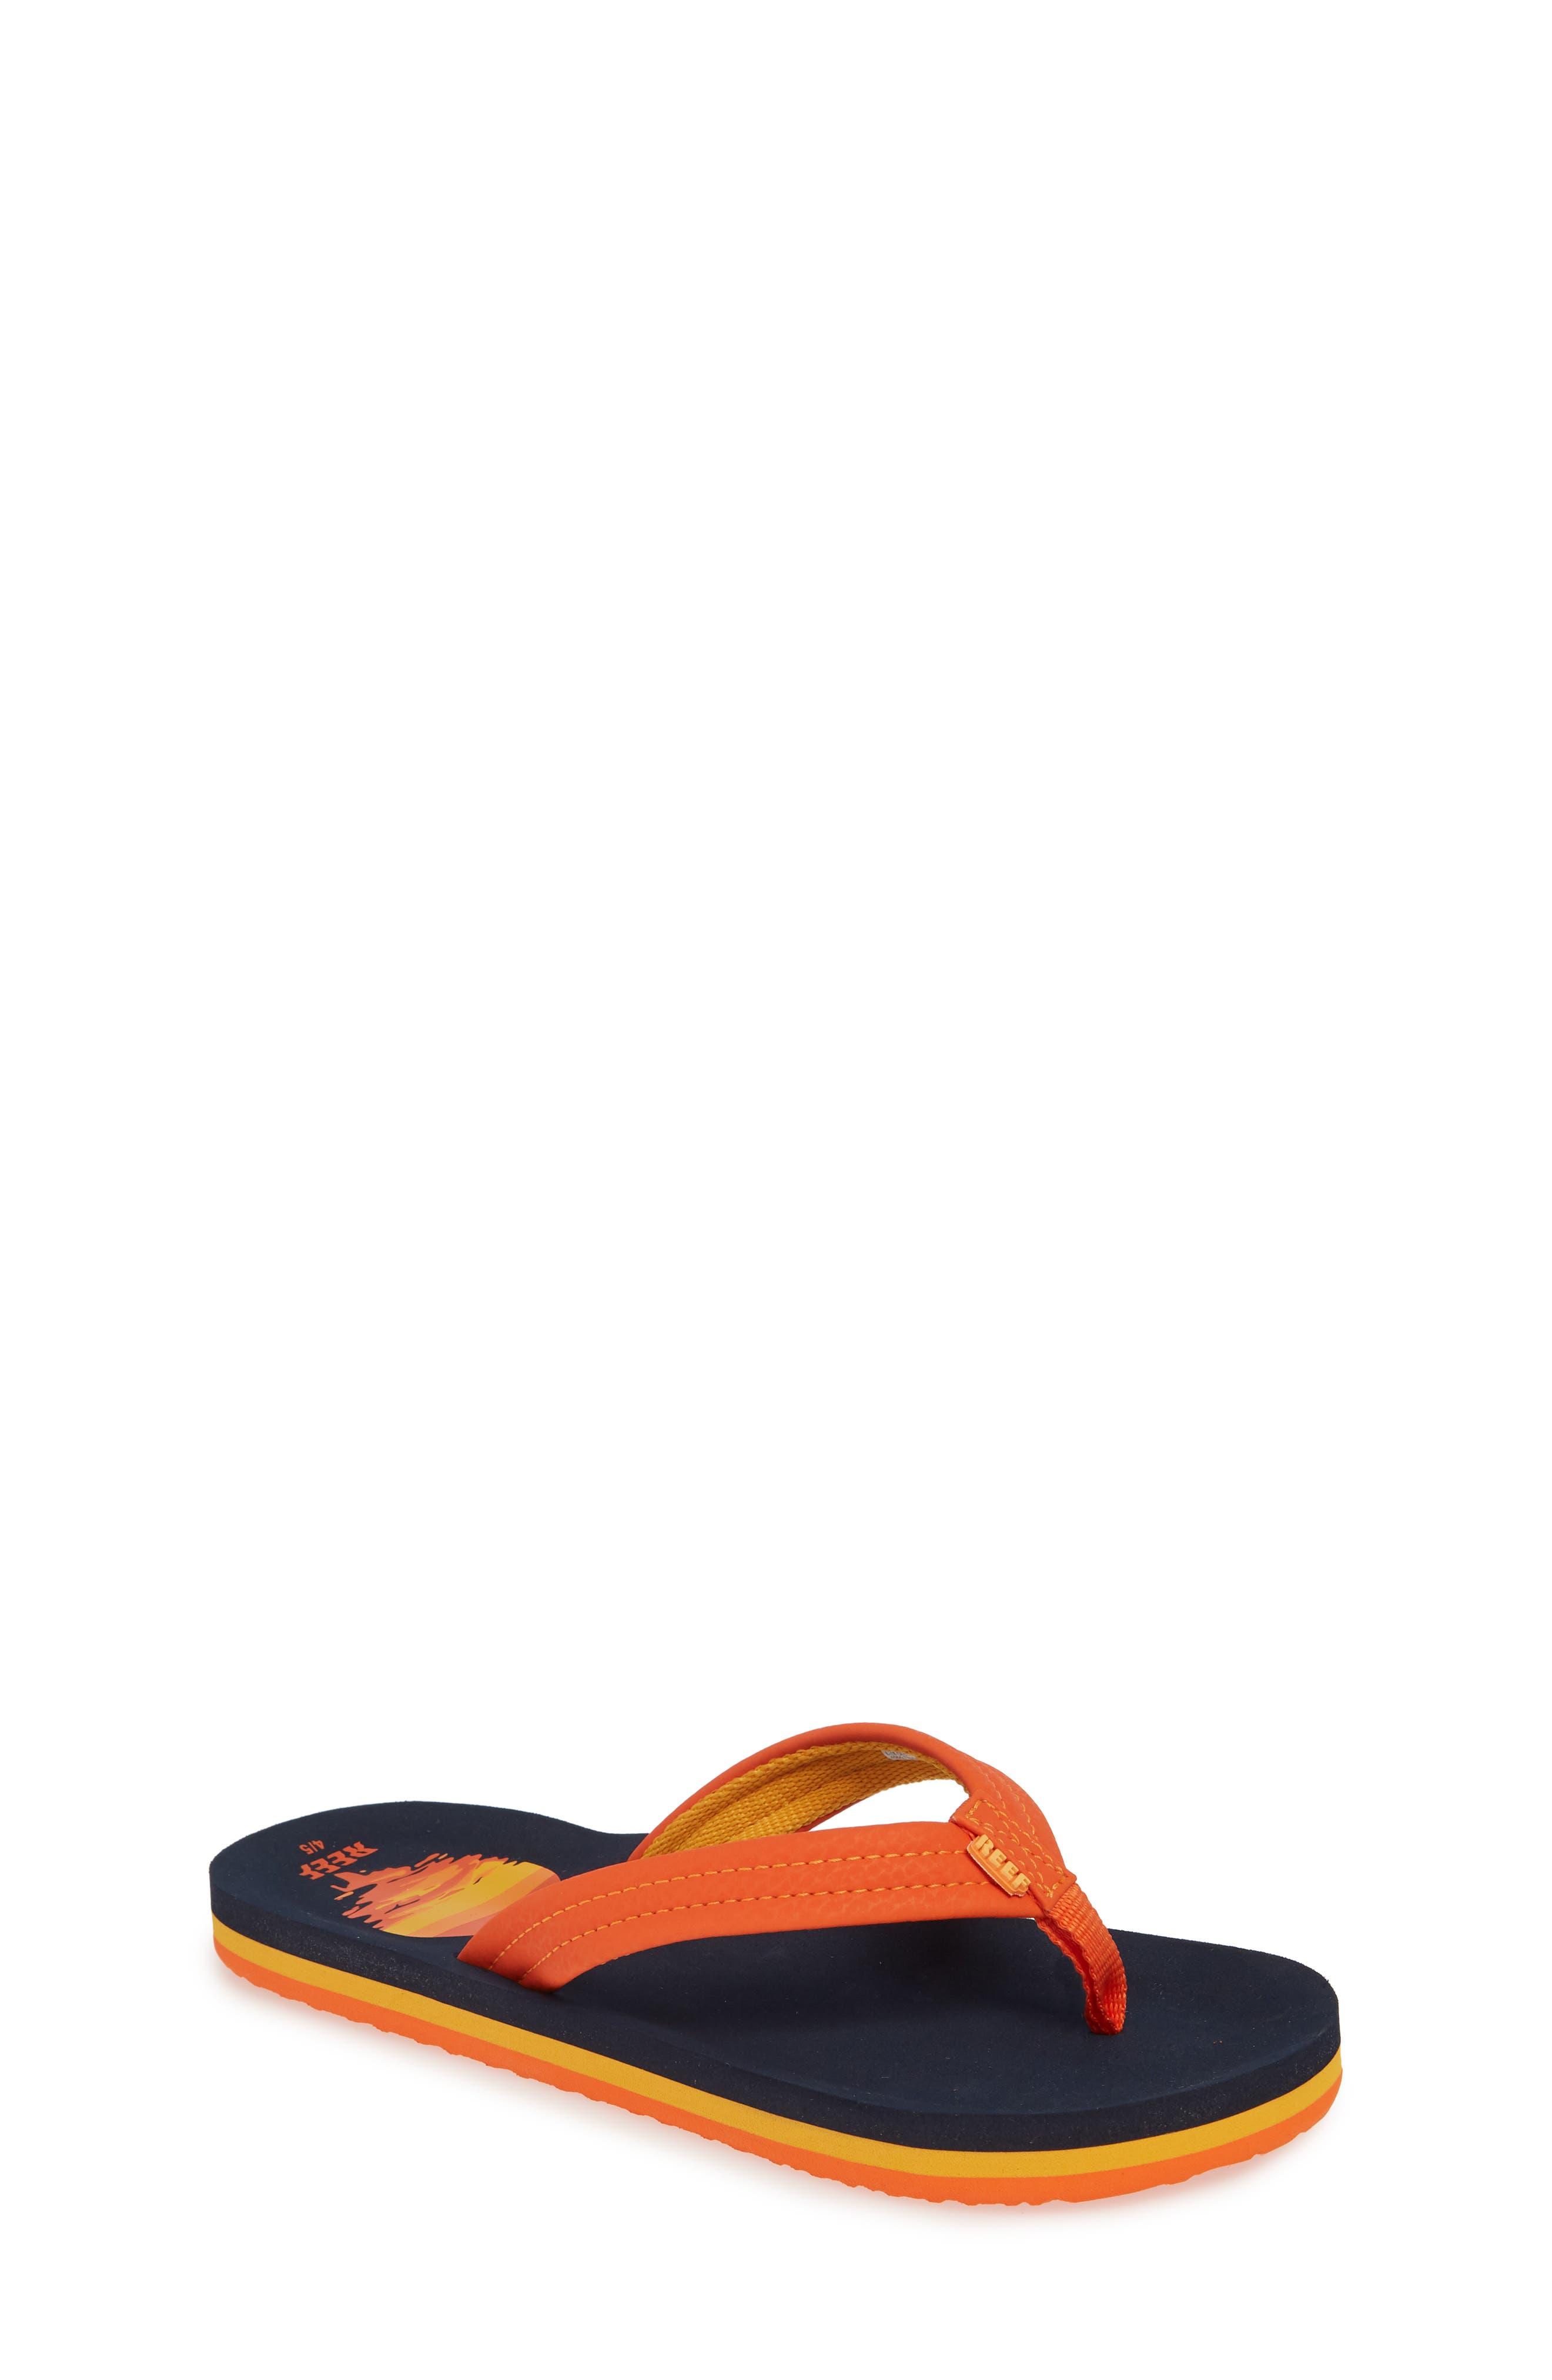 2402aacd6303 Reef Kids  Sandals